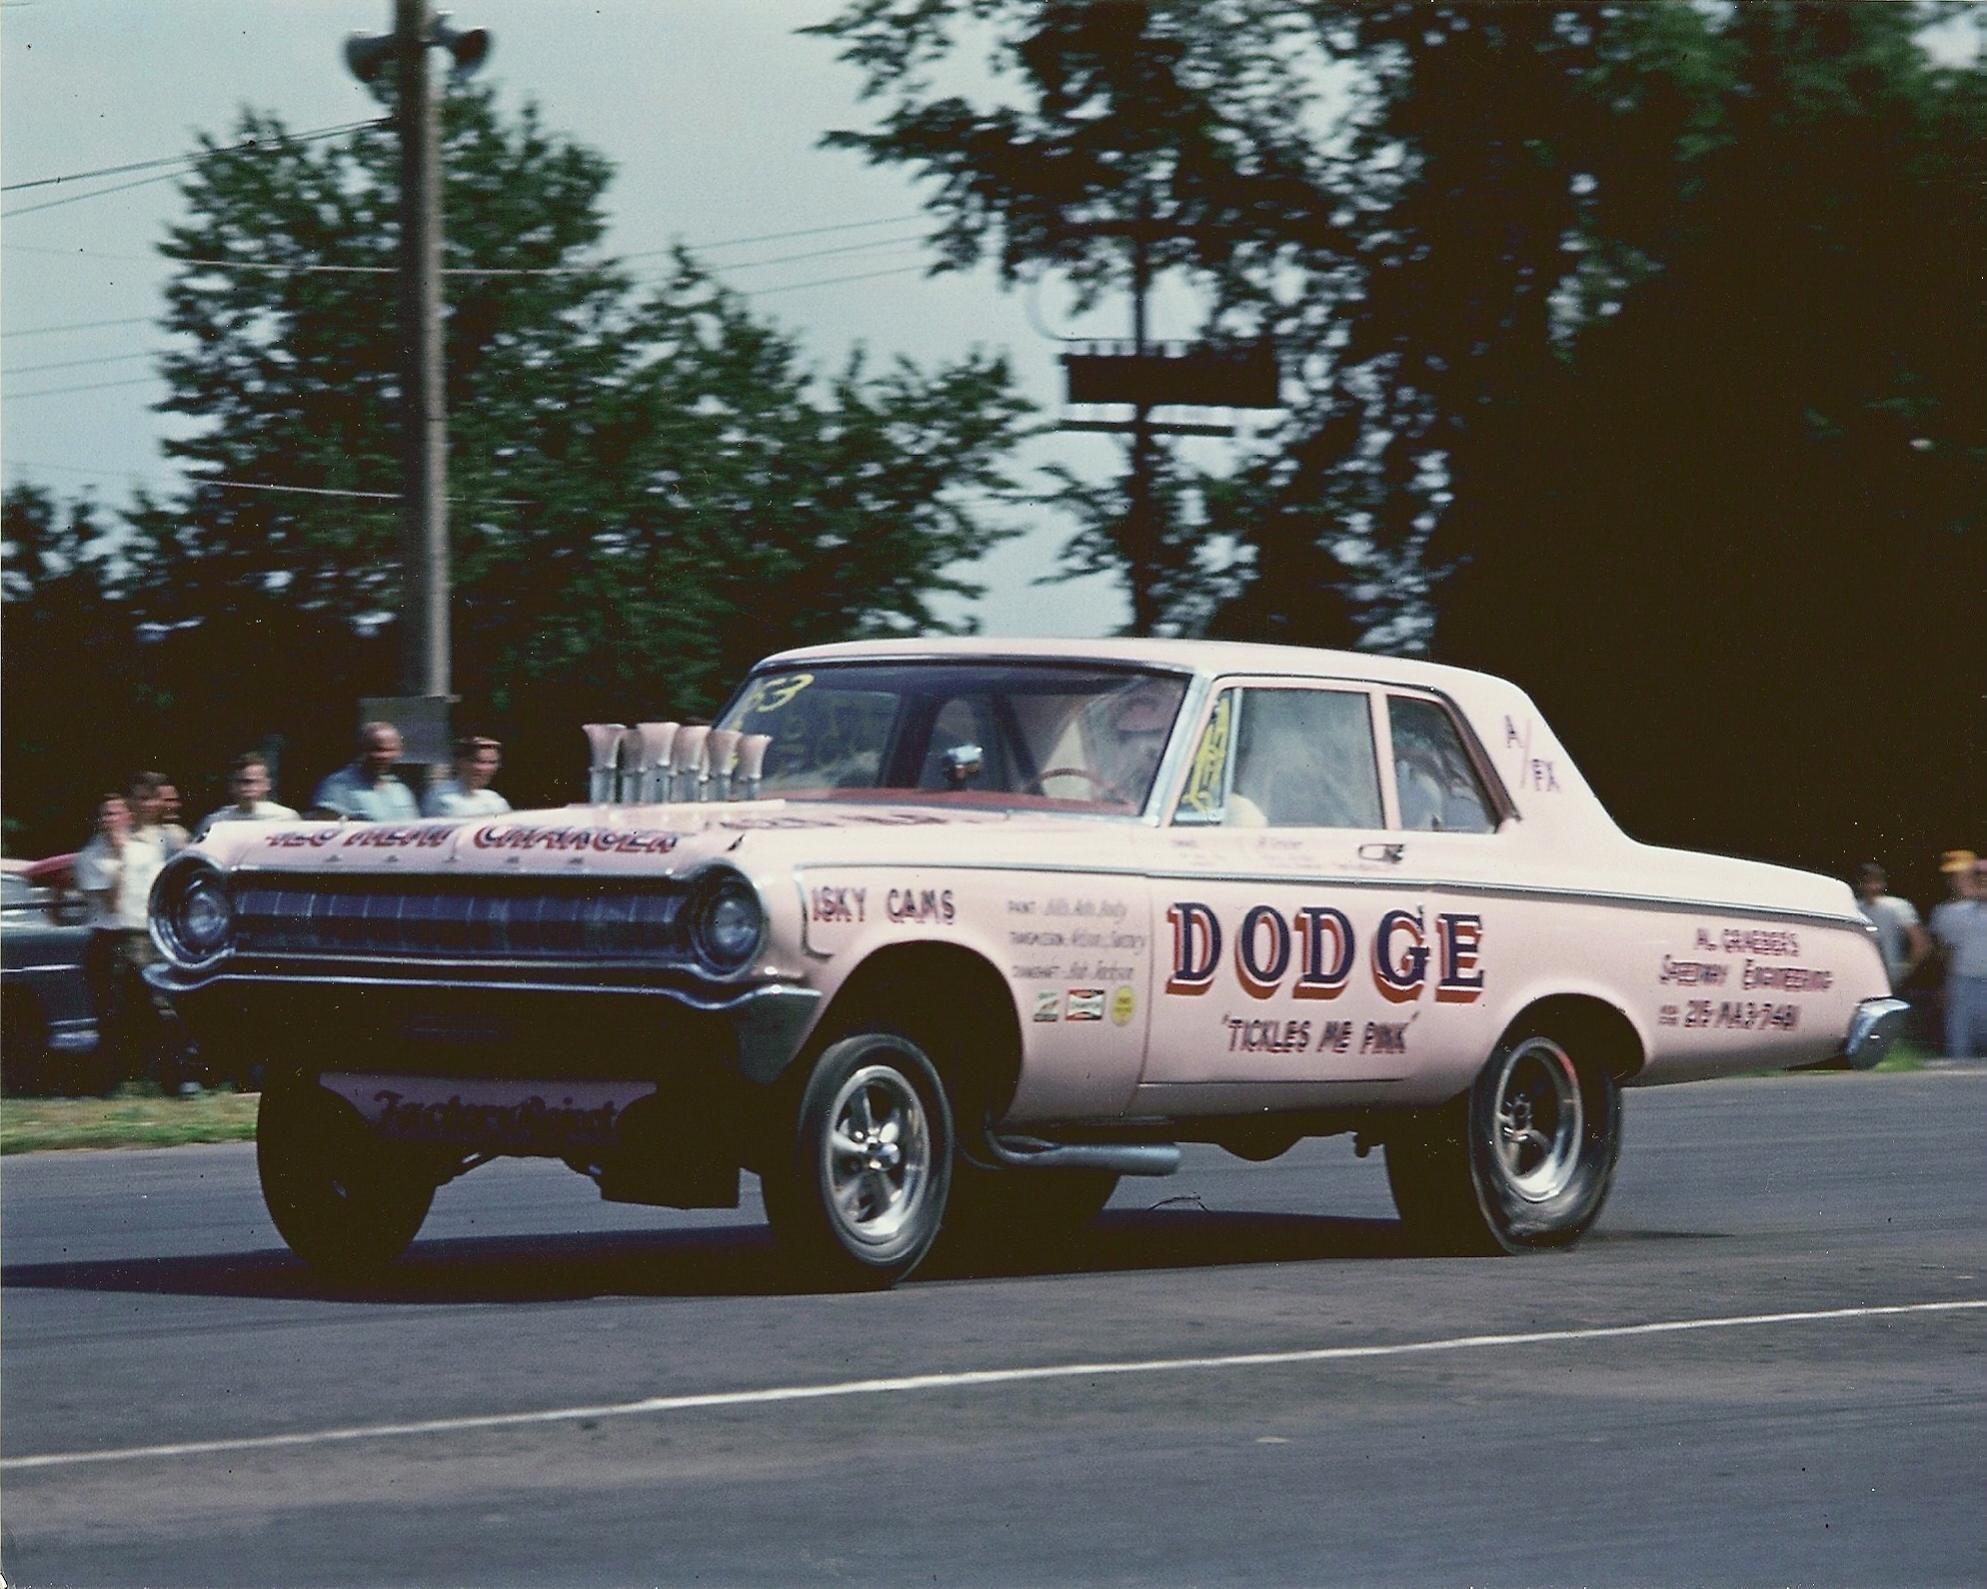 Photos of 64 dodge altered wheelbase drag cars altered wheelbase drag race racing hot